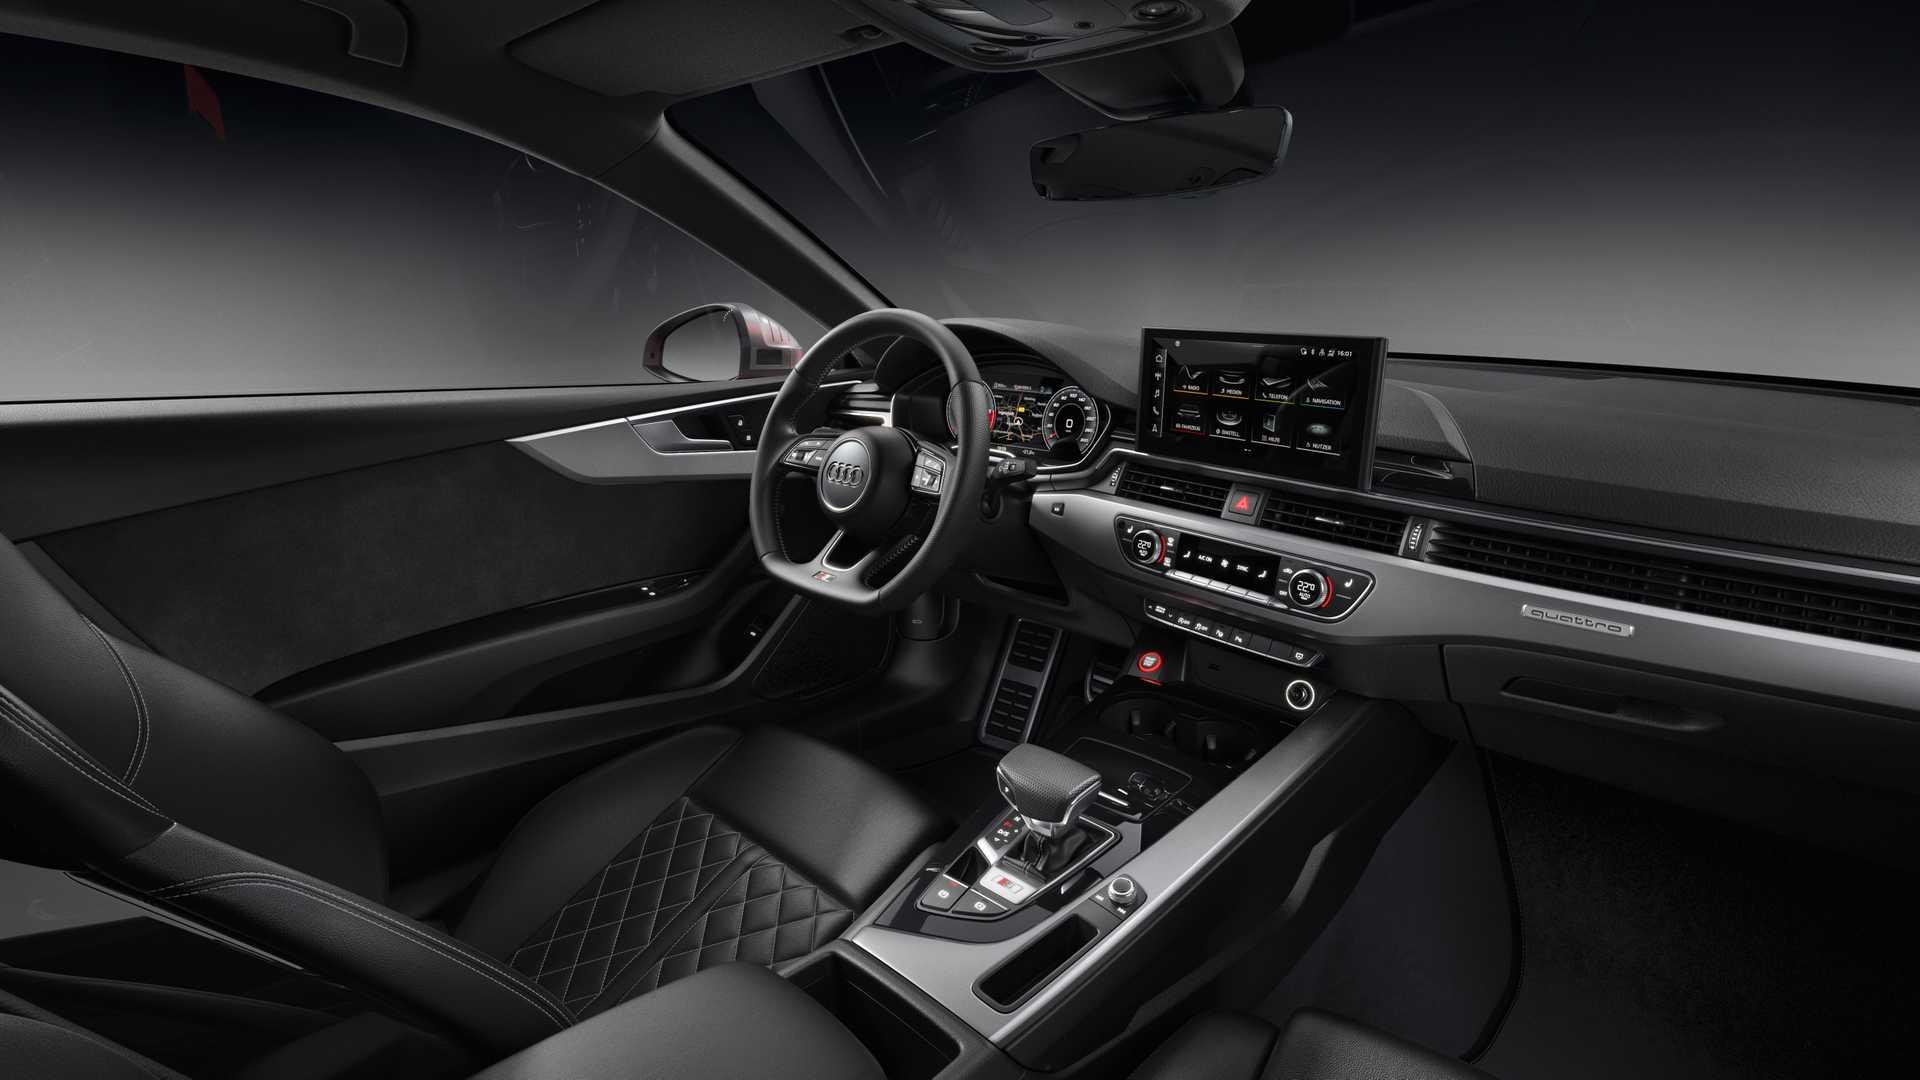 2020-audi-s5-coupe-tdi-3.jpg